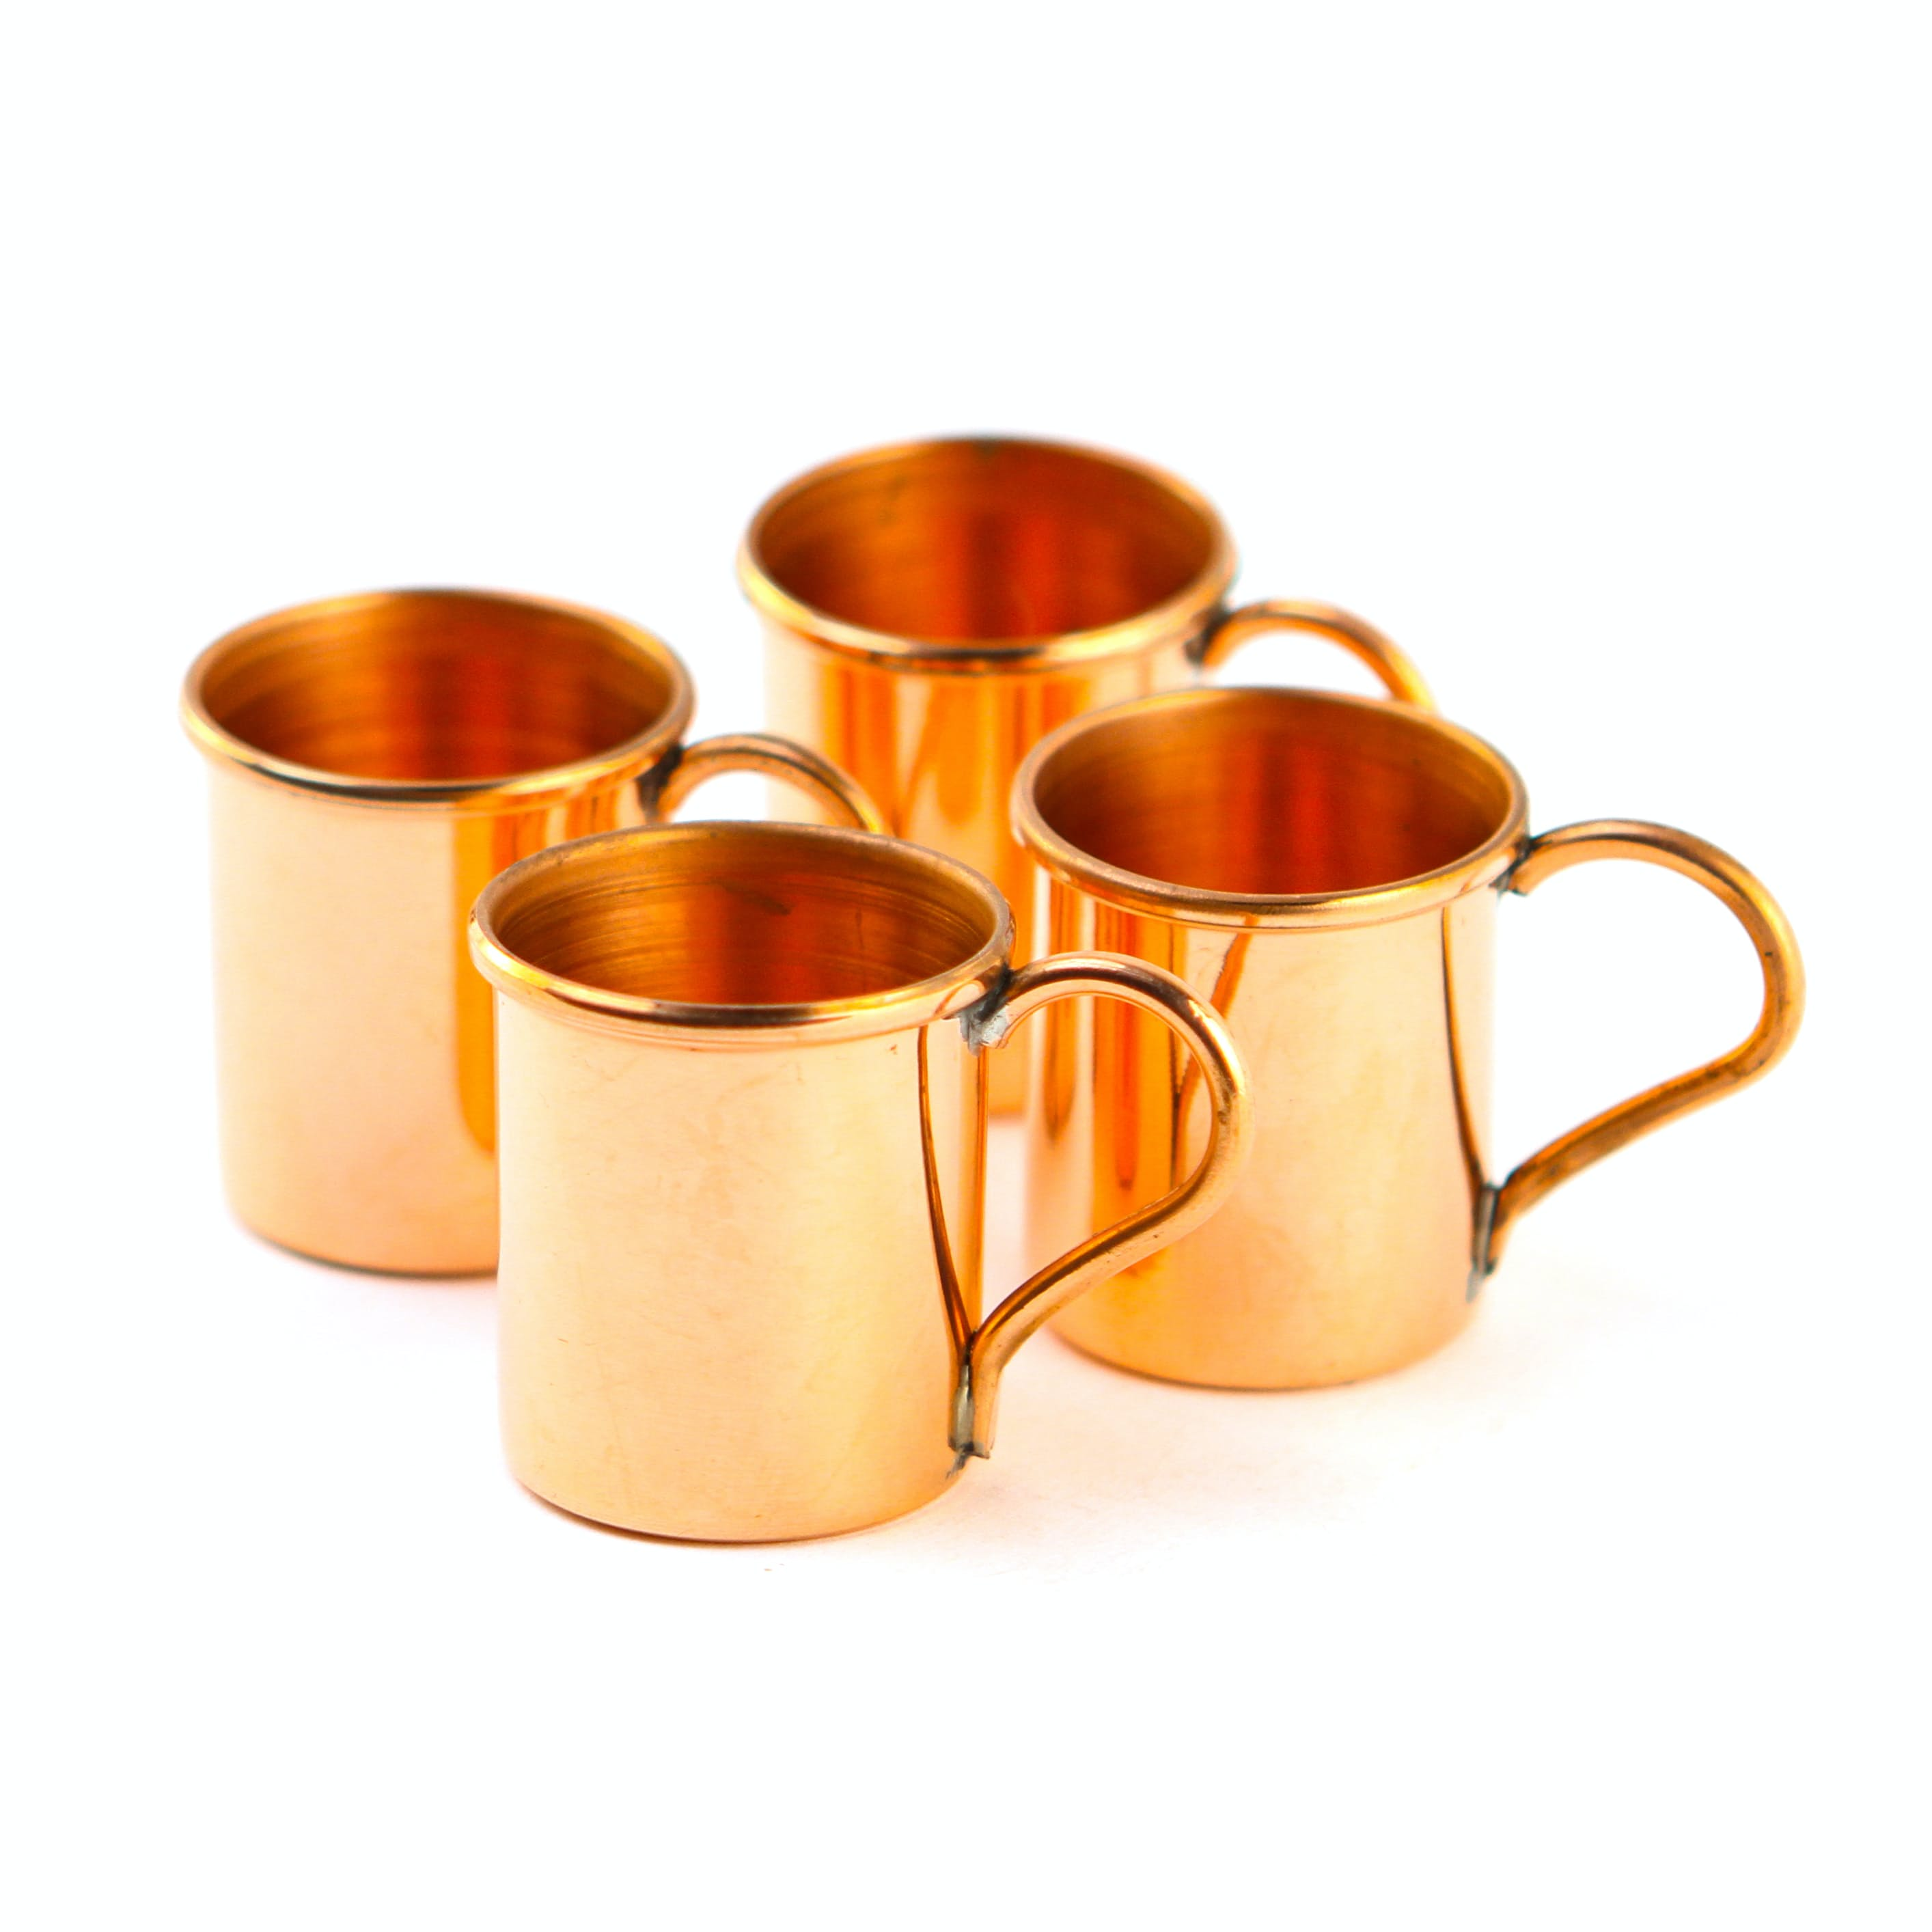 Tb7idarxsl huckberry mini moscow mule mugs 4 0 original